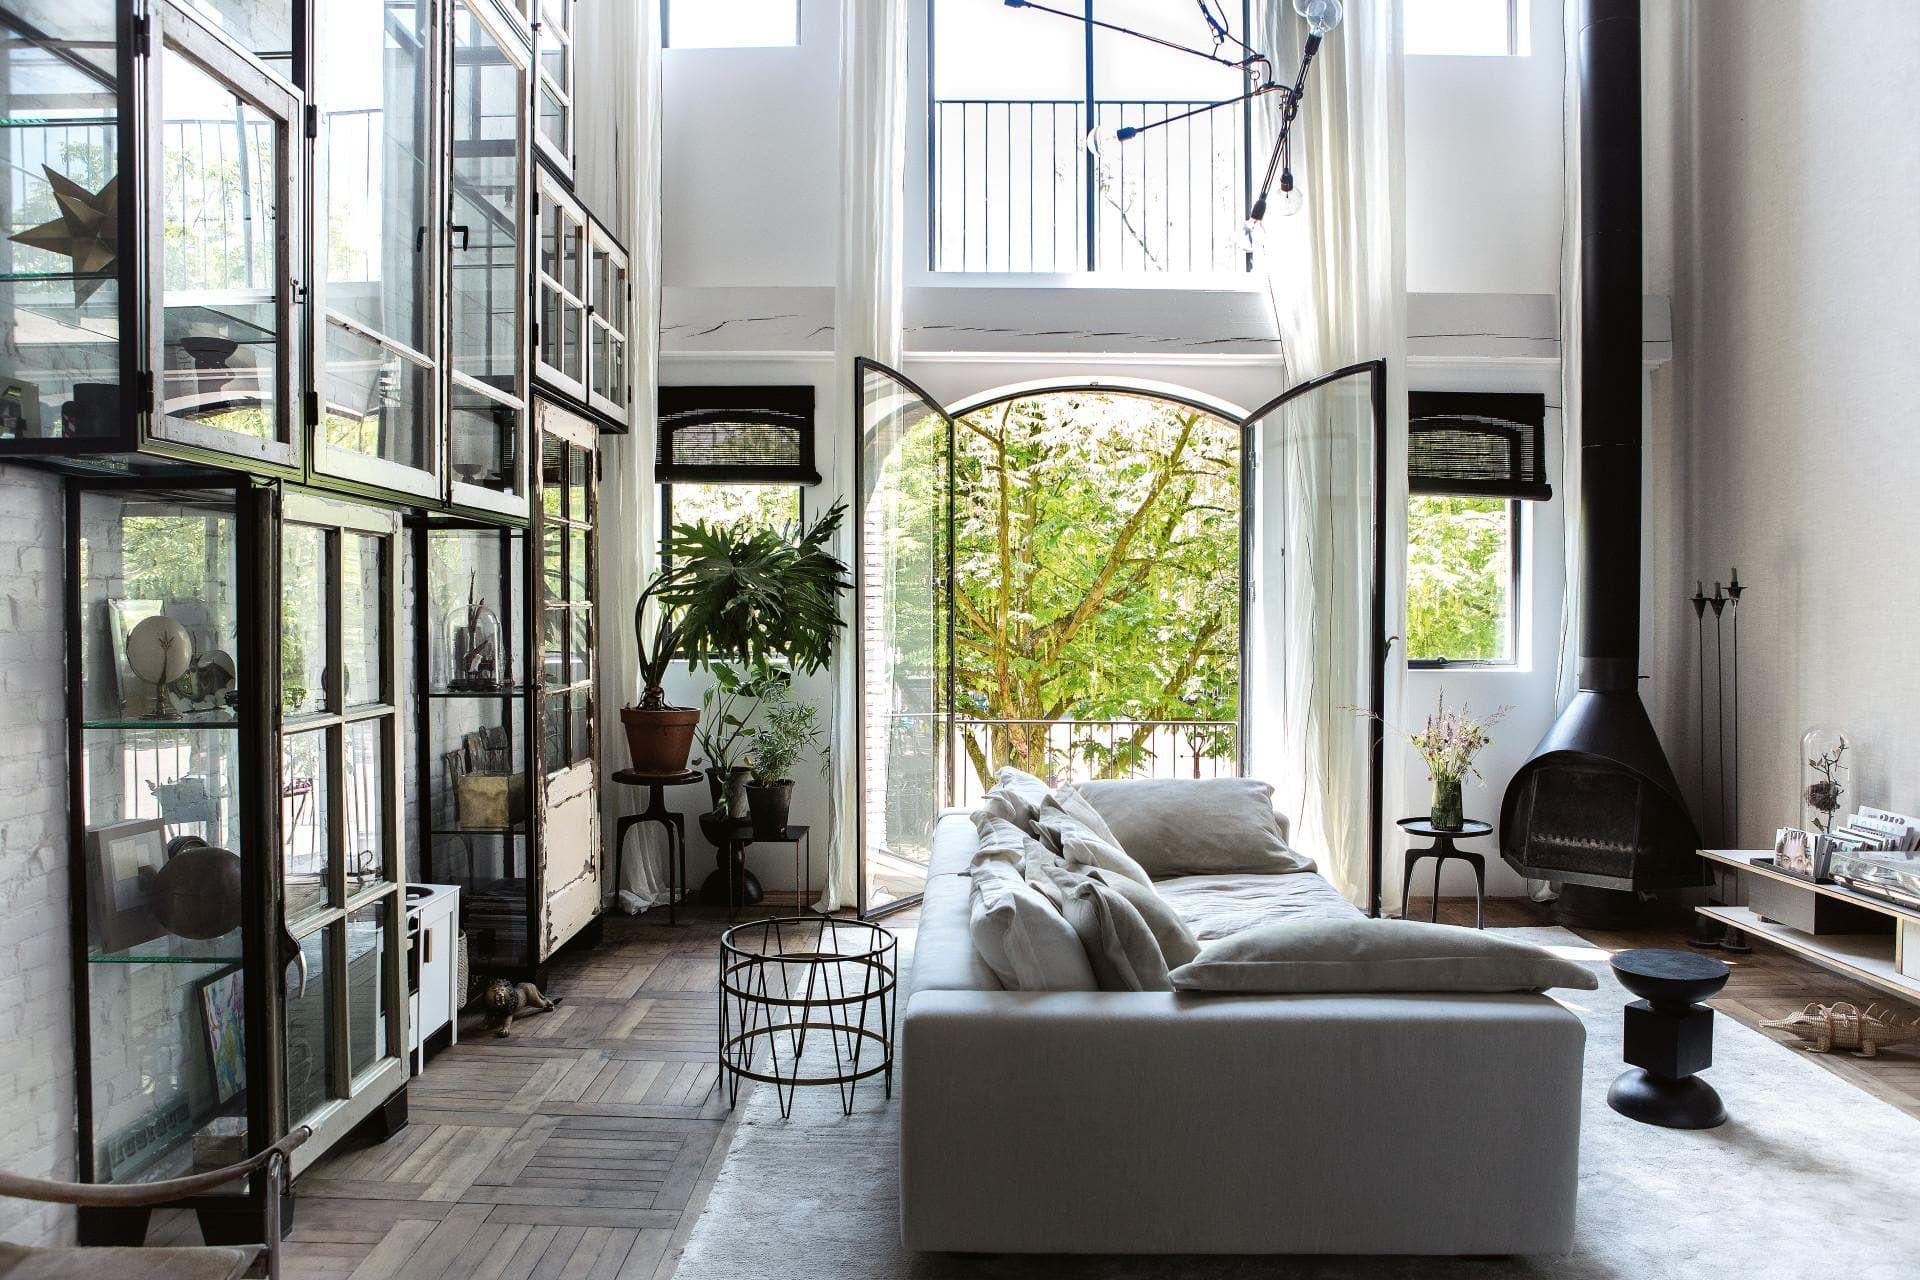 Home Tour Modern Vintage Charmer In Amsterdam Apartment 34 Best Interior Design Blogs Best Interior Design Interior Design Blog